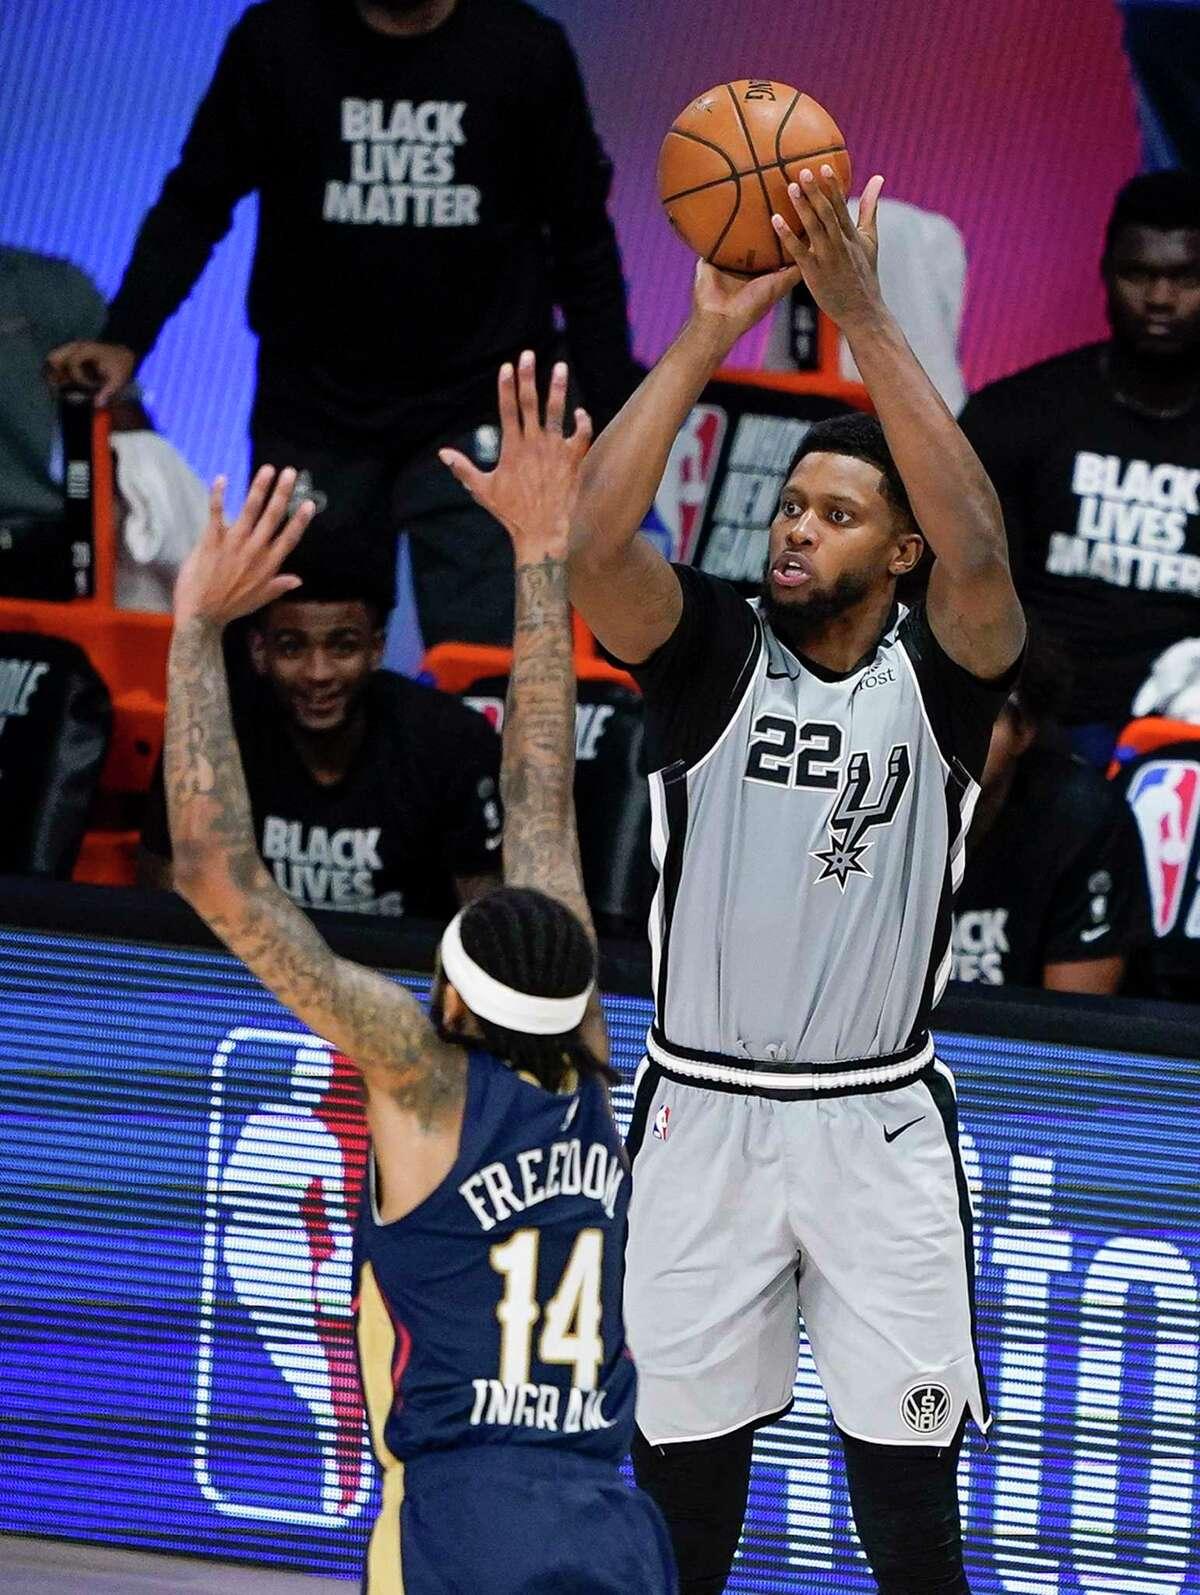 San Antonio Spurs forward Rudy Gay (22) takes a shot over New Orleans Pelicans forward Brandon Ingram (14) during the second half of an NBA basketball game, Sunday, Aug. 9, 2020, in Lake Buena Vista, Fla. (AP Photo/Ashley Landis, Pool)